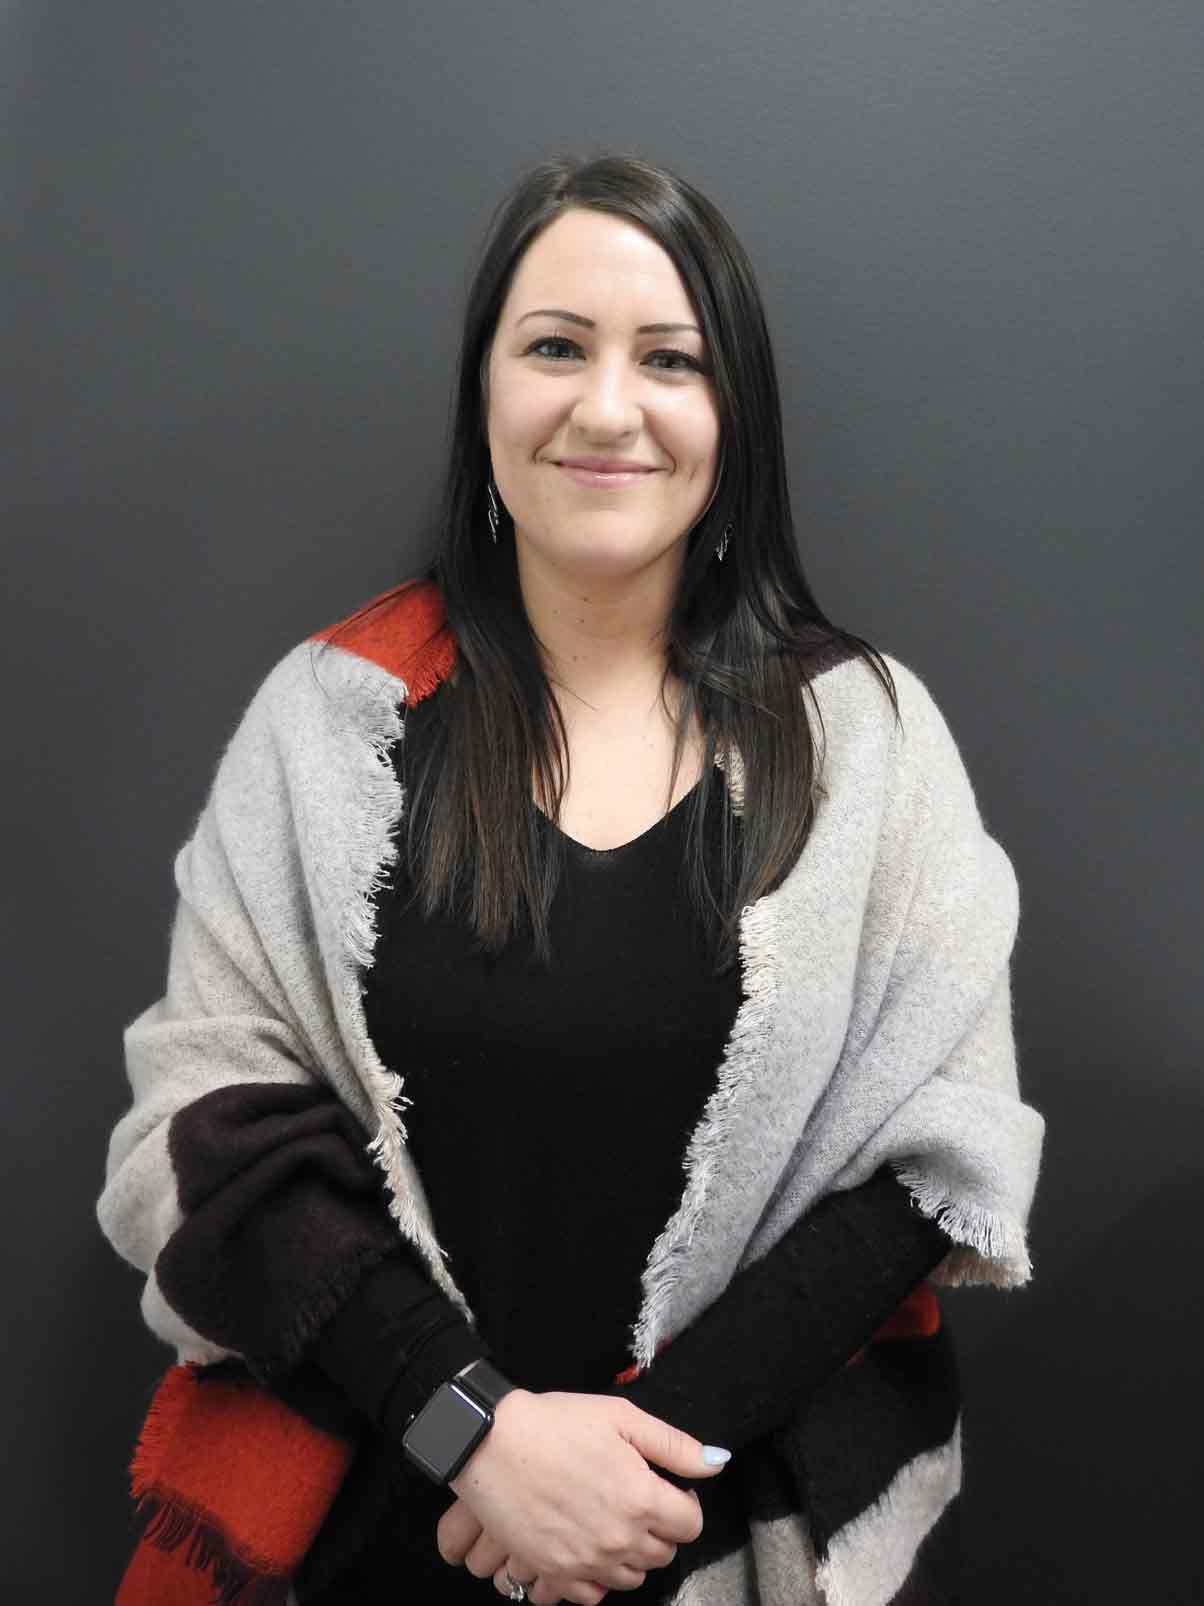 Headshot of Sarah Kitzmiller, Regional Property Manager at Uptown Rentals.